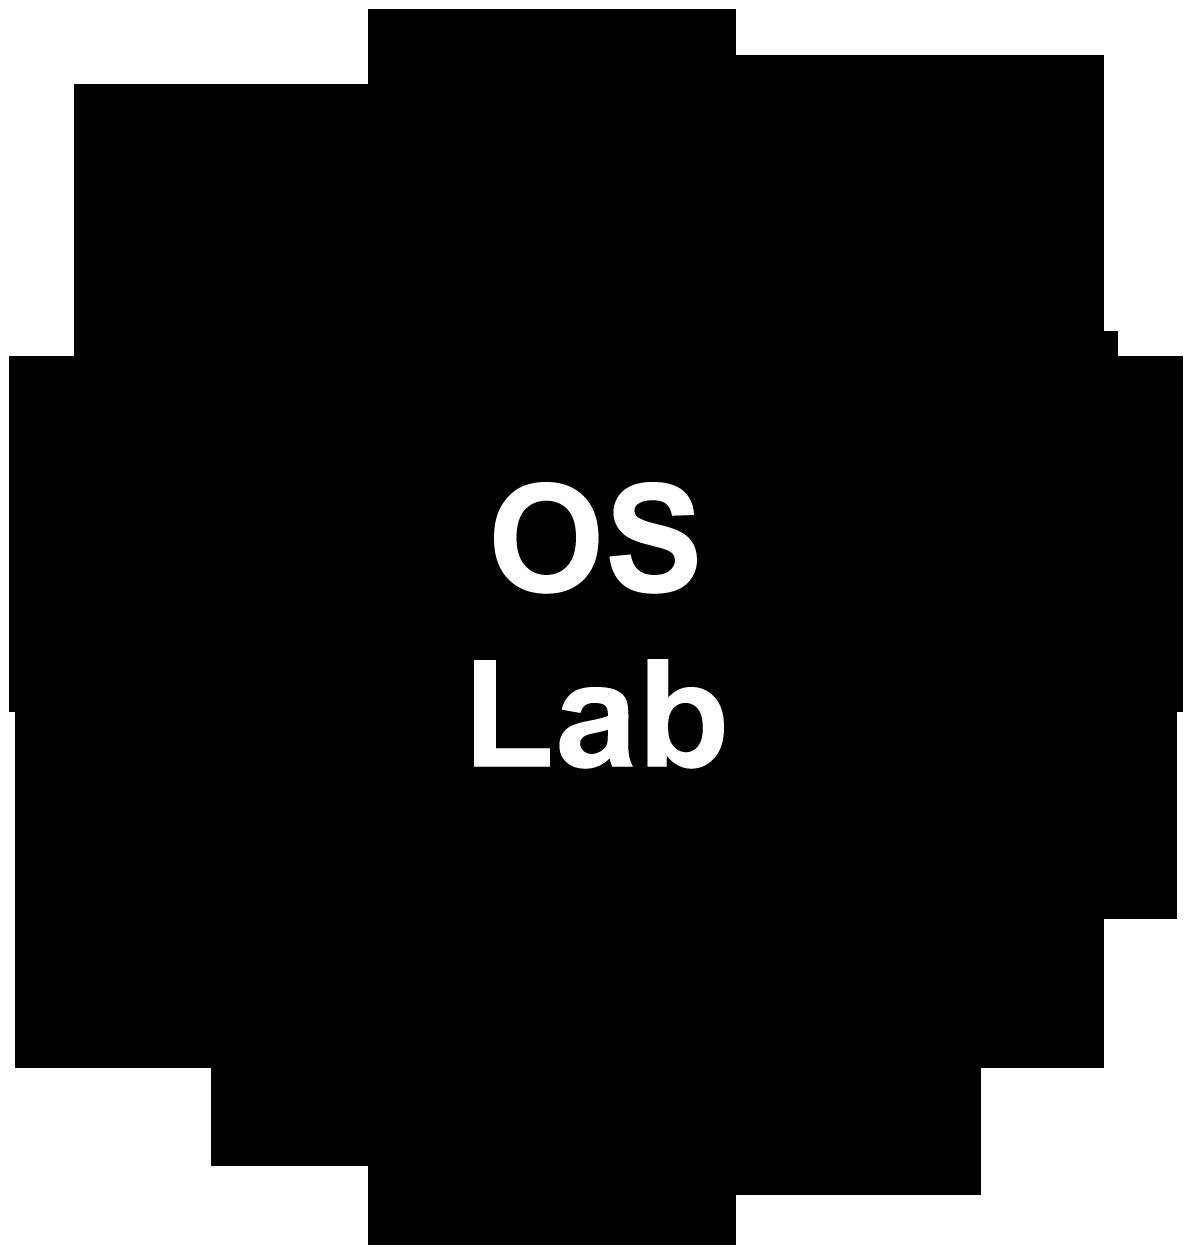 The OS Lab